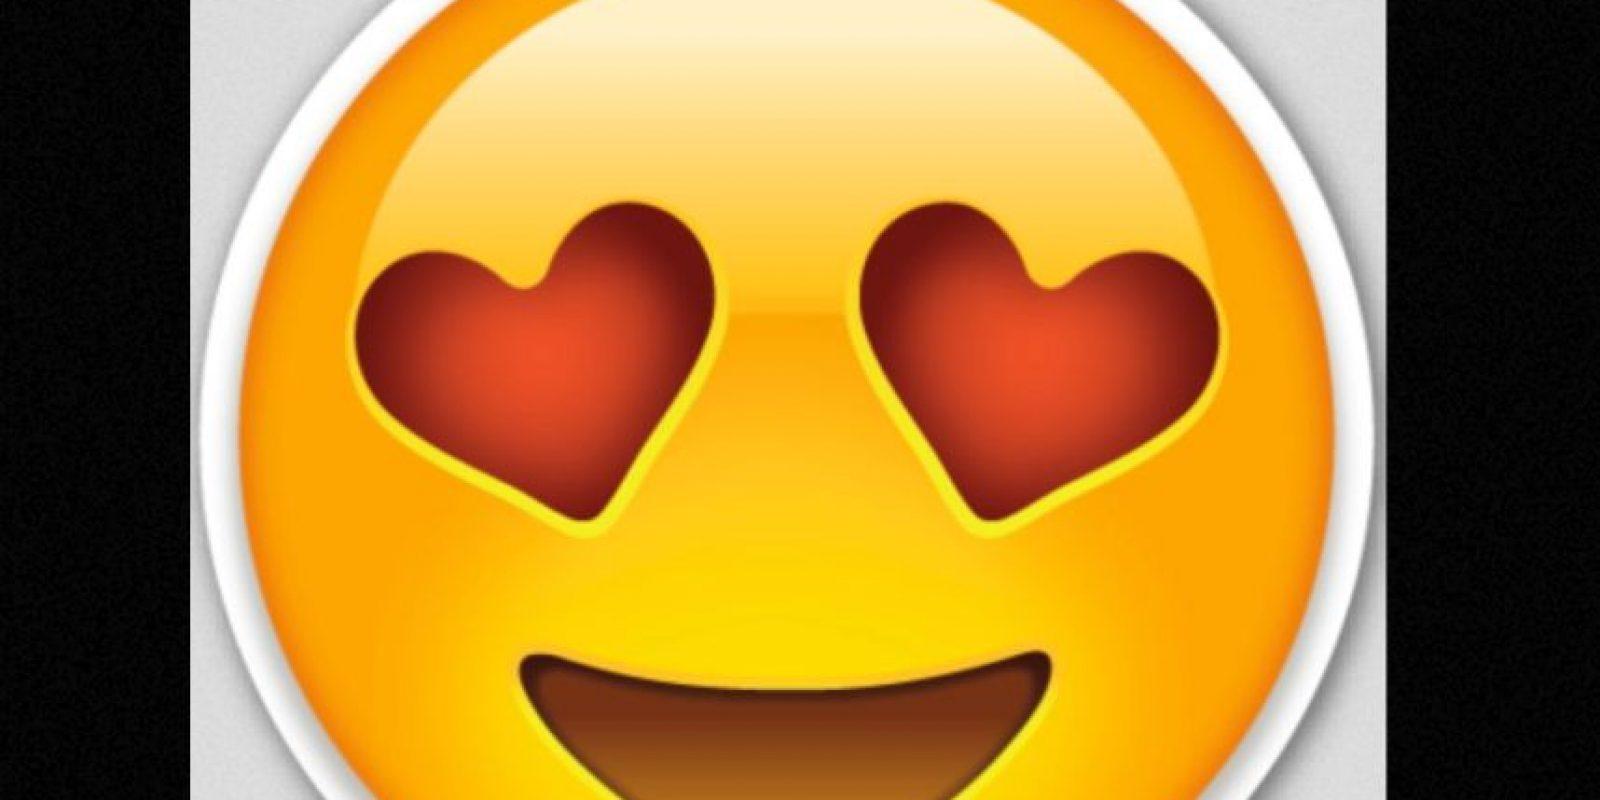 Caras de amor Foto:Emojipedia